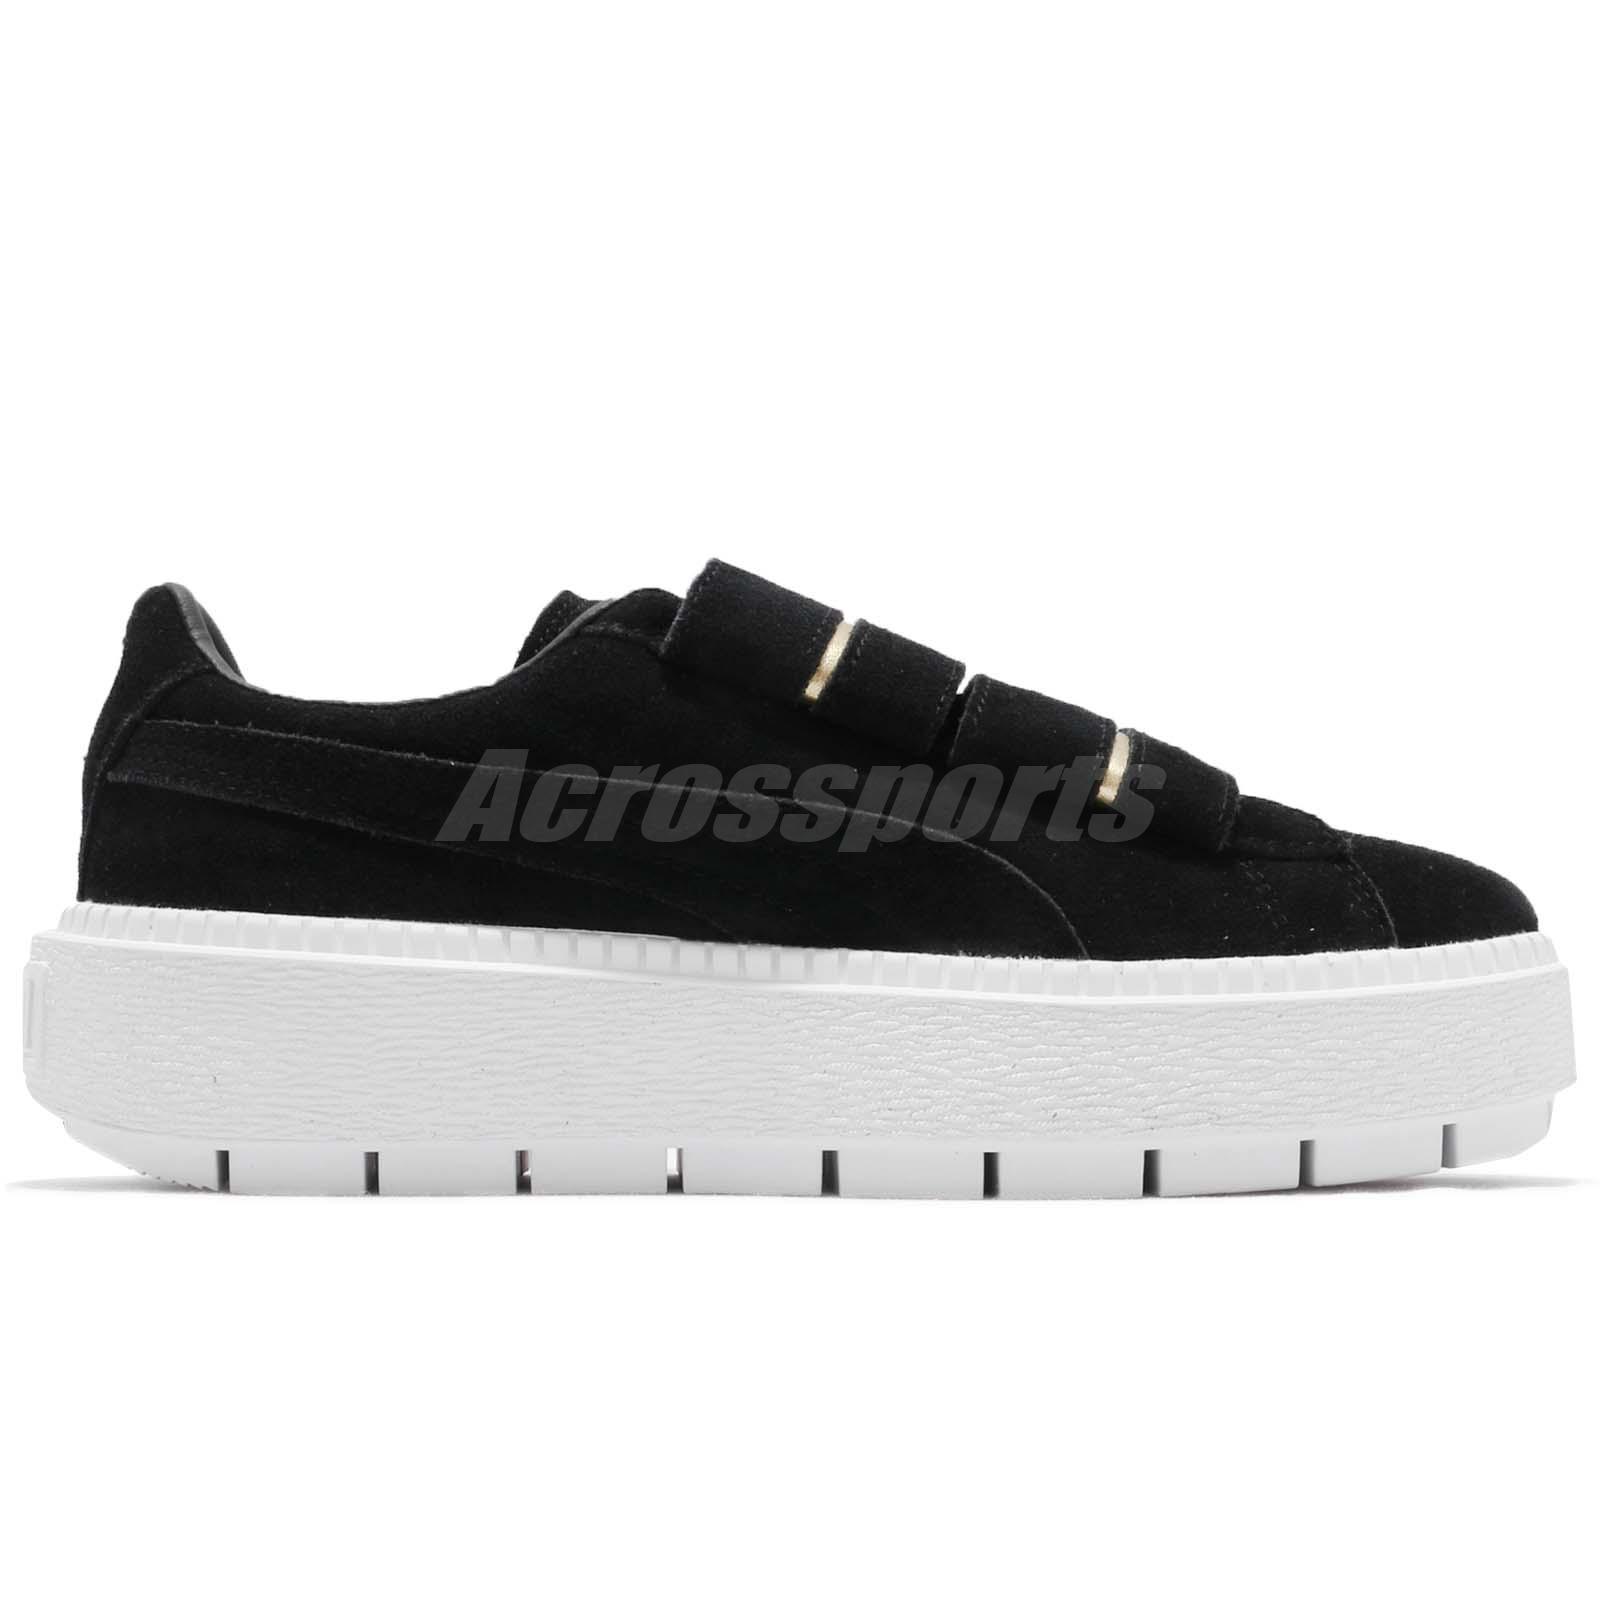 Puma Platform Trace Strap Wns Black White Women Casual Shoes ... 7e6e68f4b